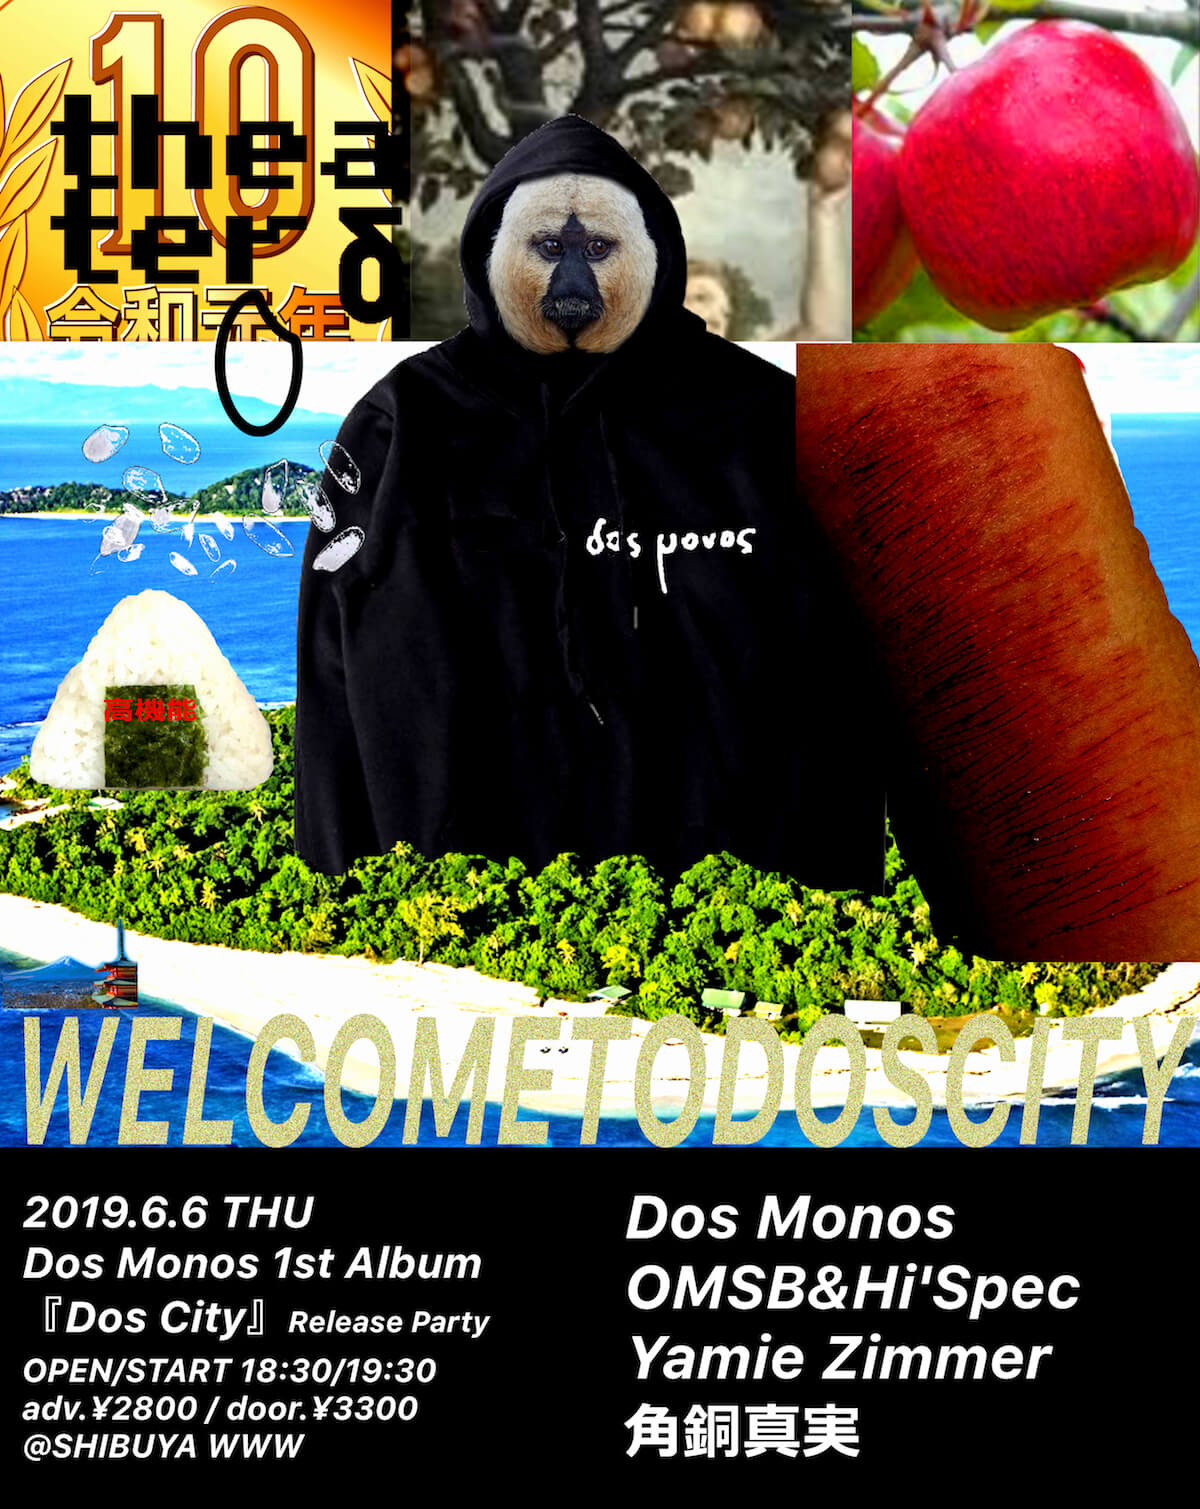 Dos Monos、リリパ&初自主企画イベントのゲストにOMSB & Hi'Spec、YamieZimmer、角銅真実の出演が発表 music190510-dos-monos-3